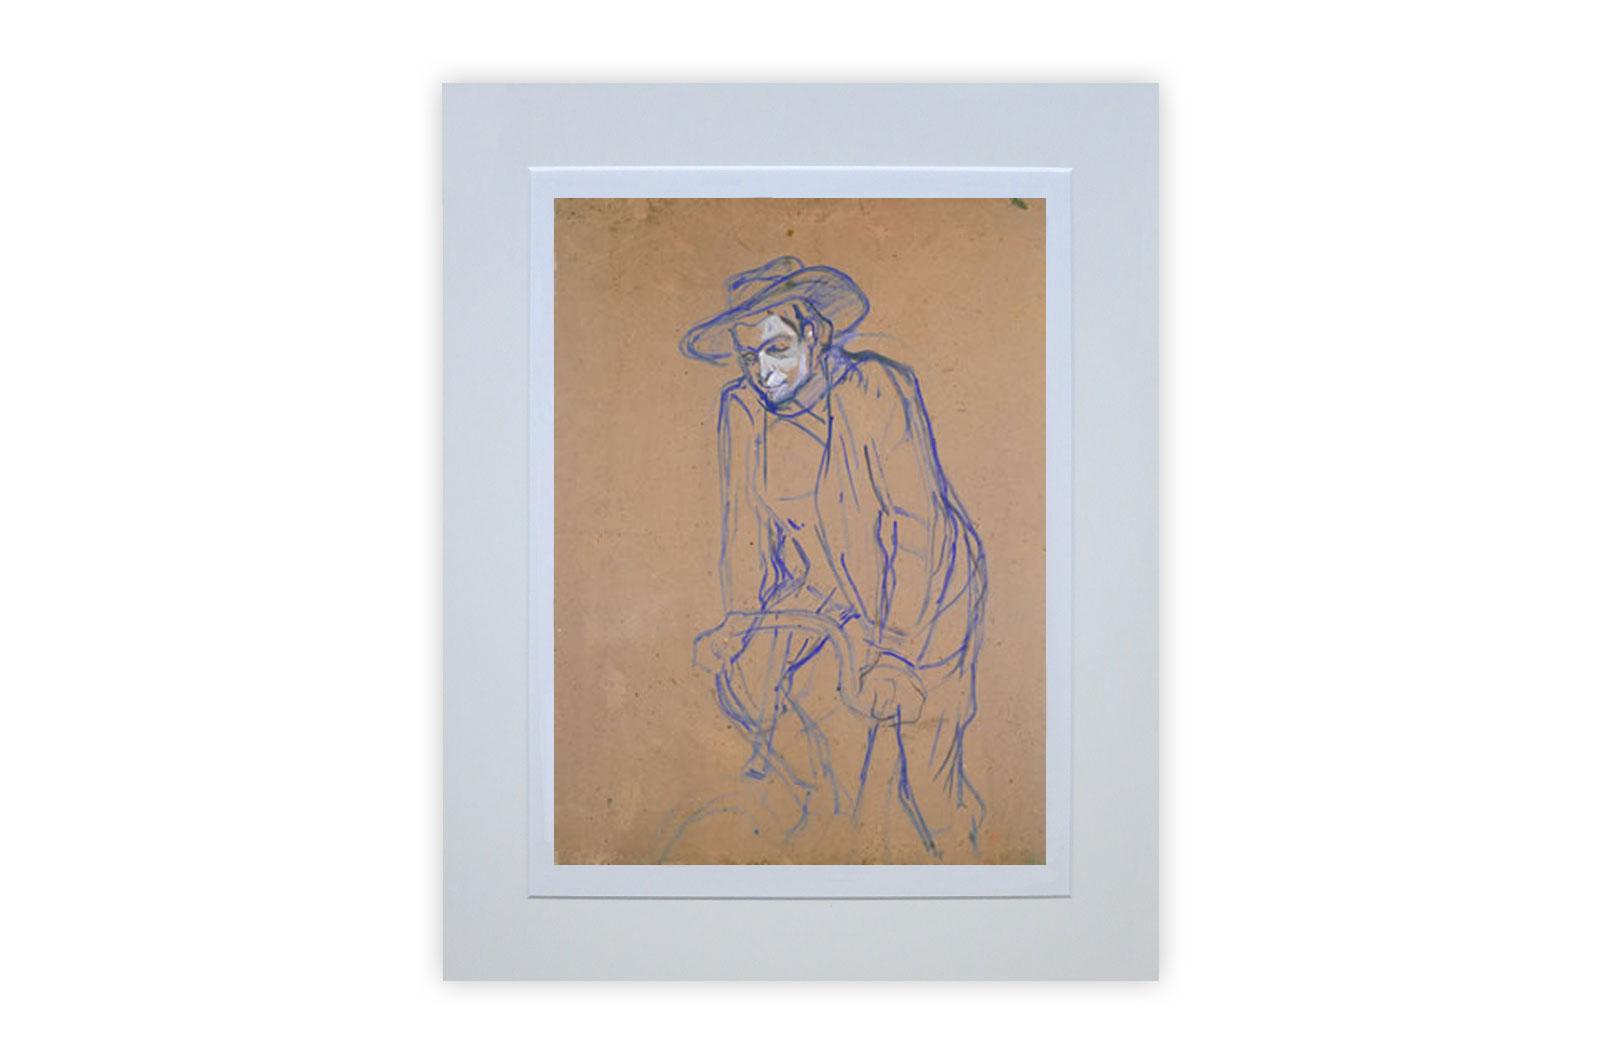 Aristide Bruant Riding a Bicycle by Henri de Toulouse-Lautrec – Giclee Print